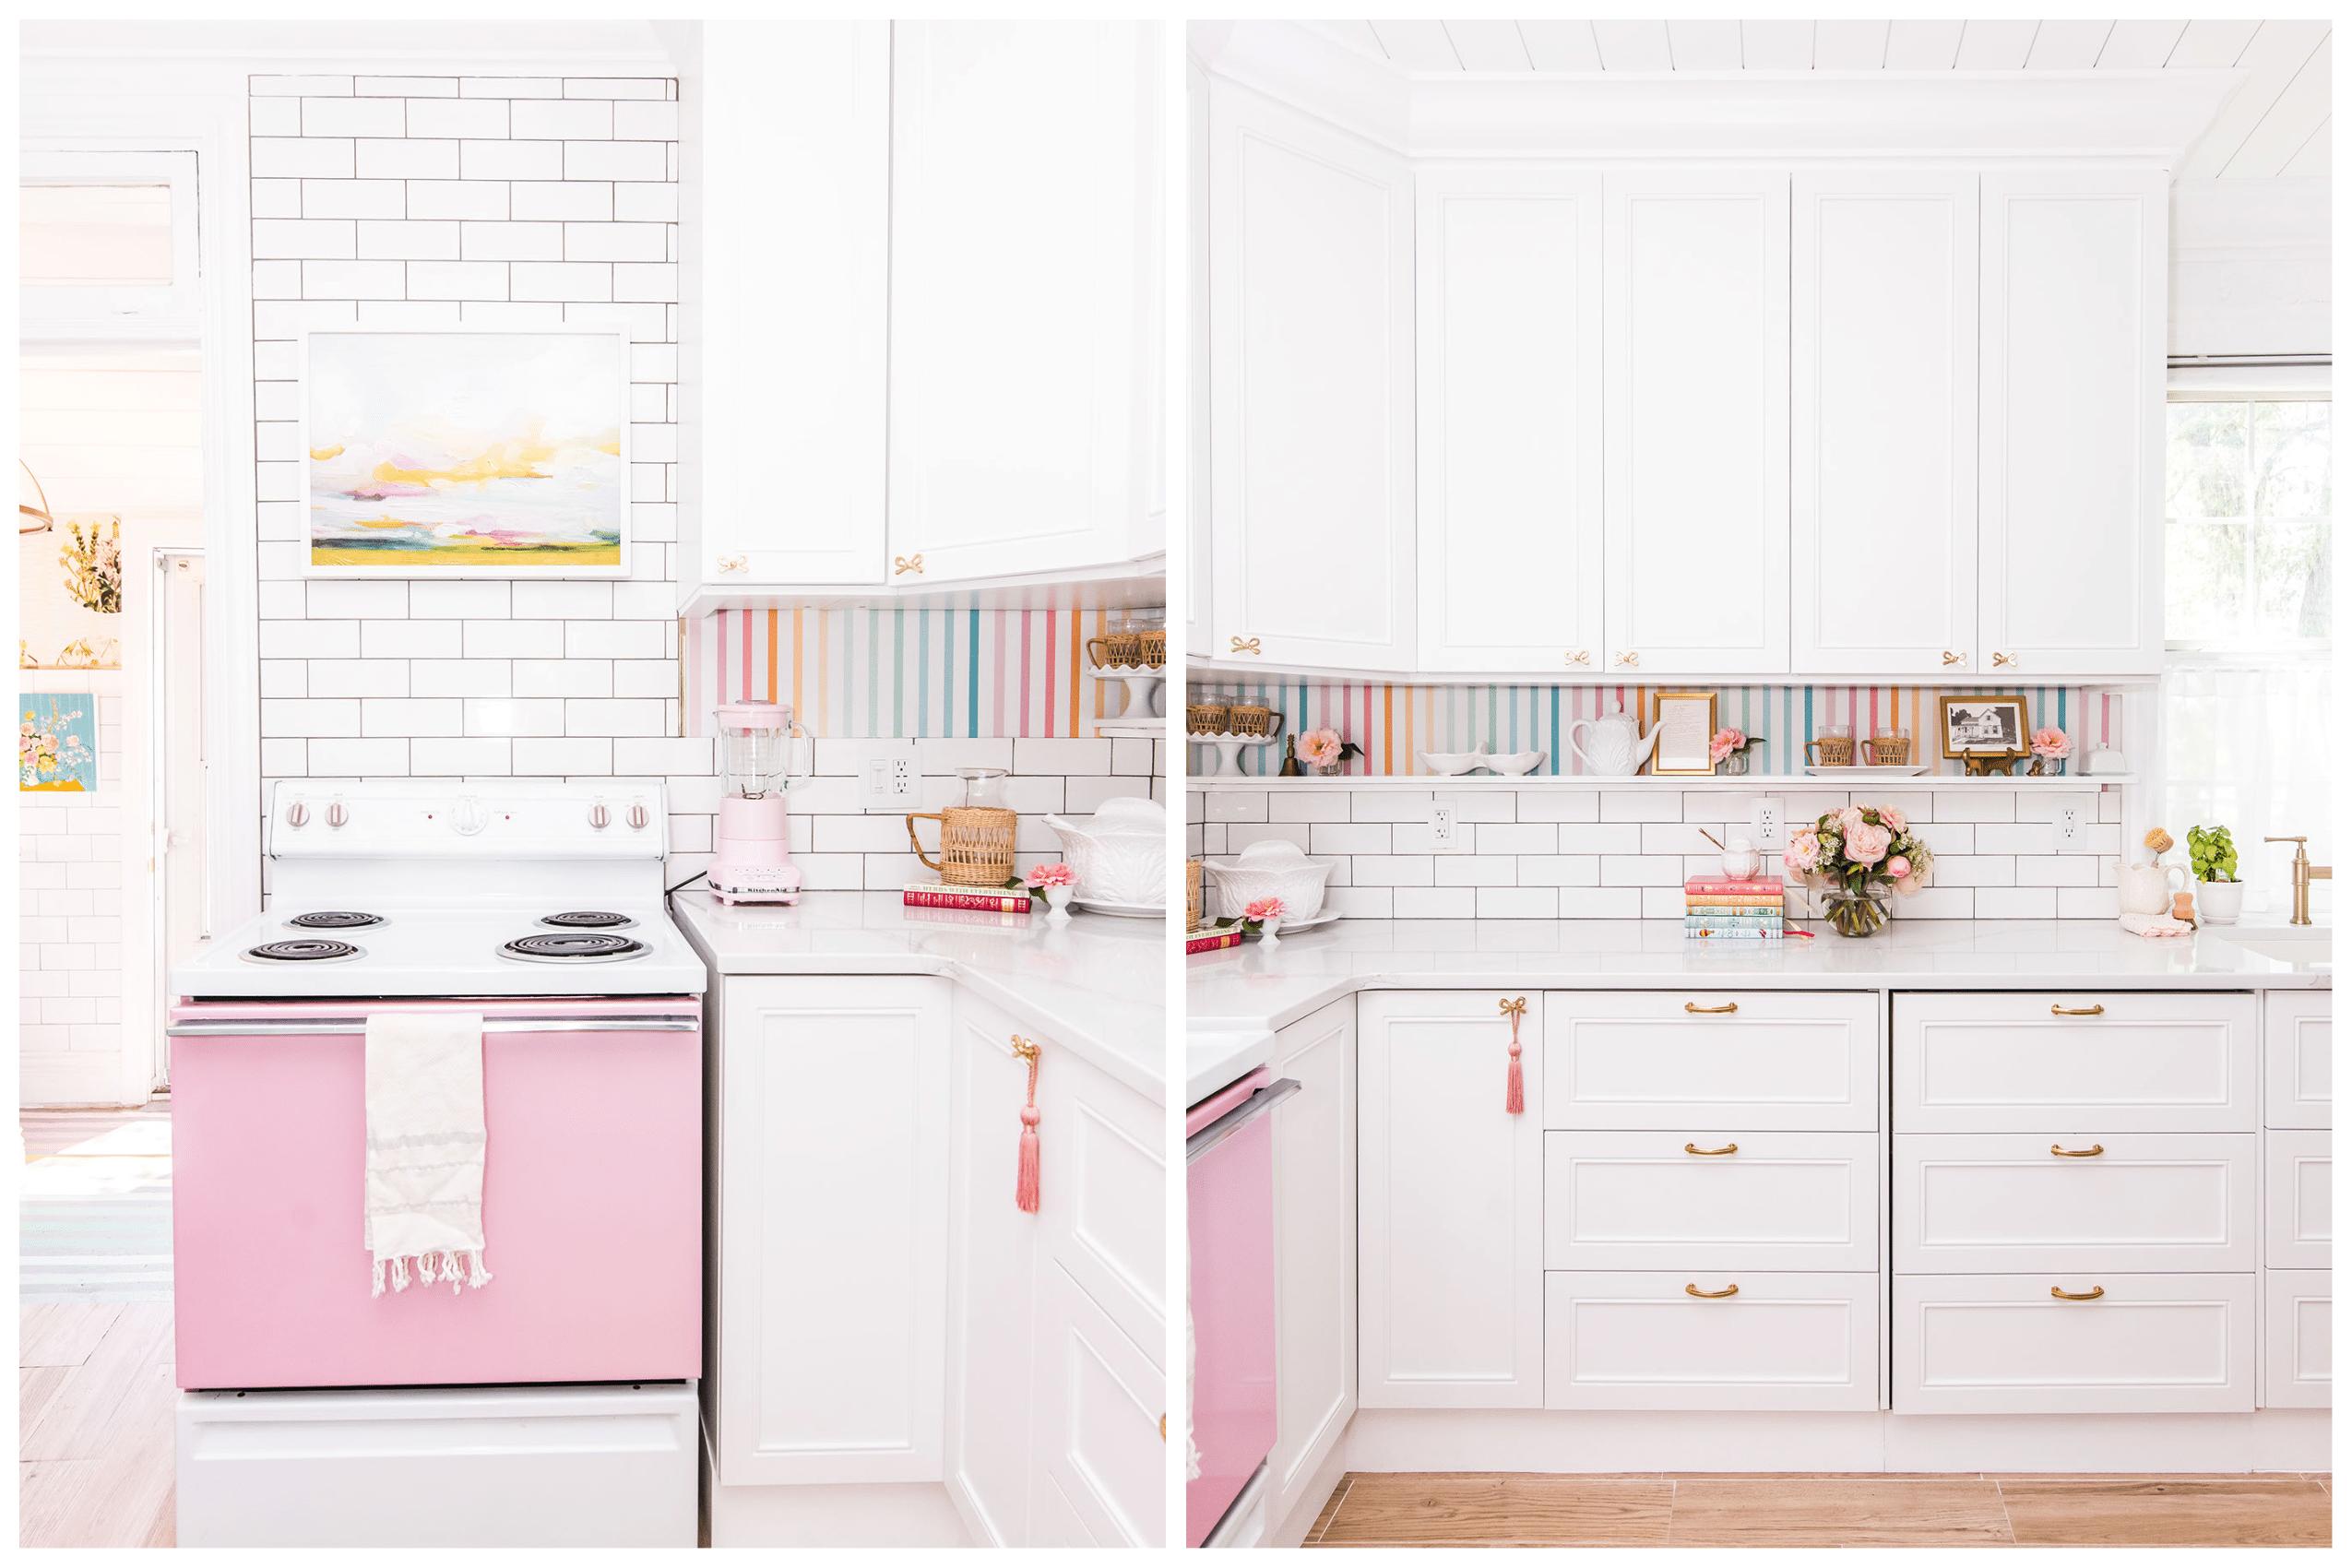 bright kitchen with white cabinets and white subway tile backsplash